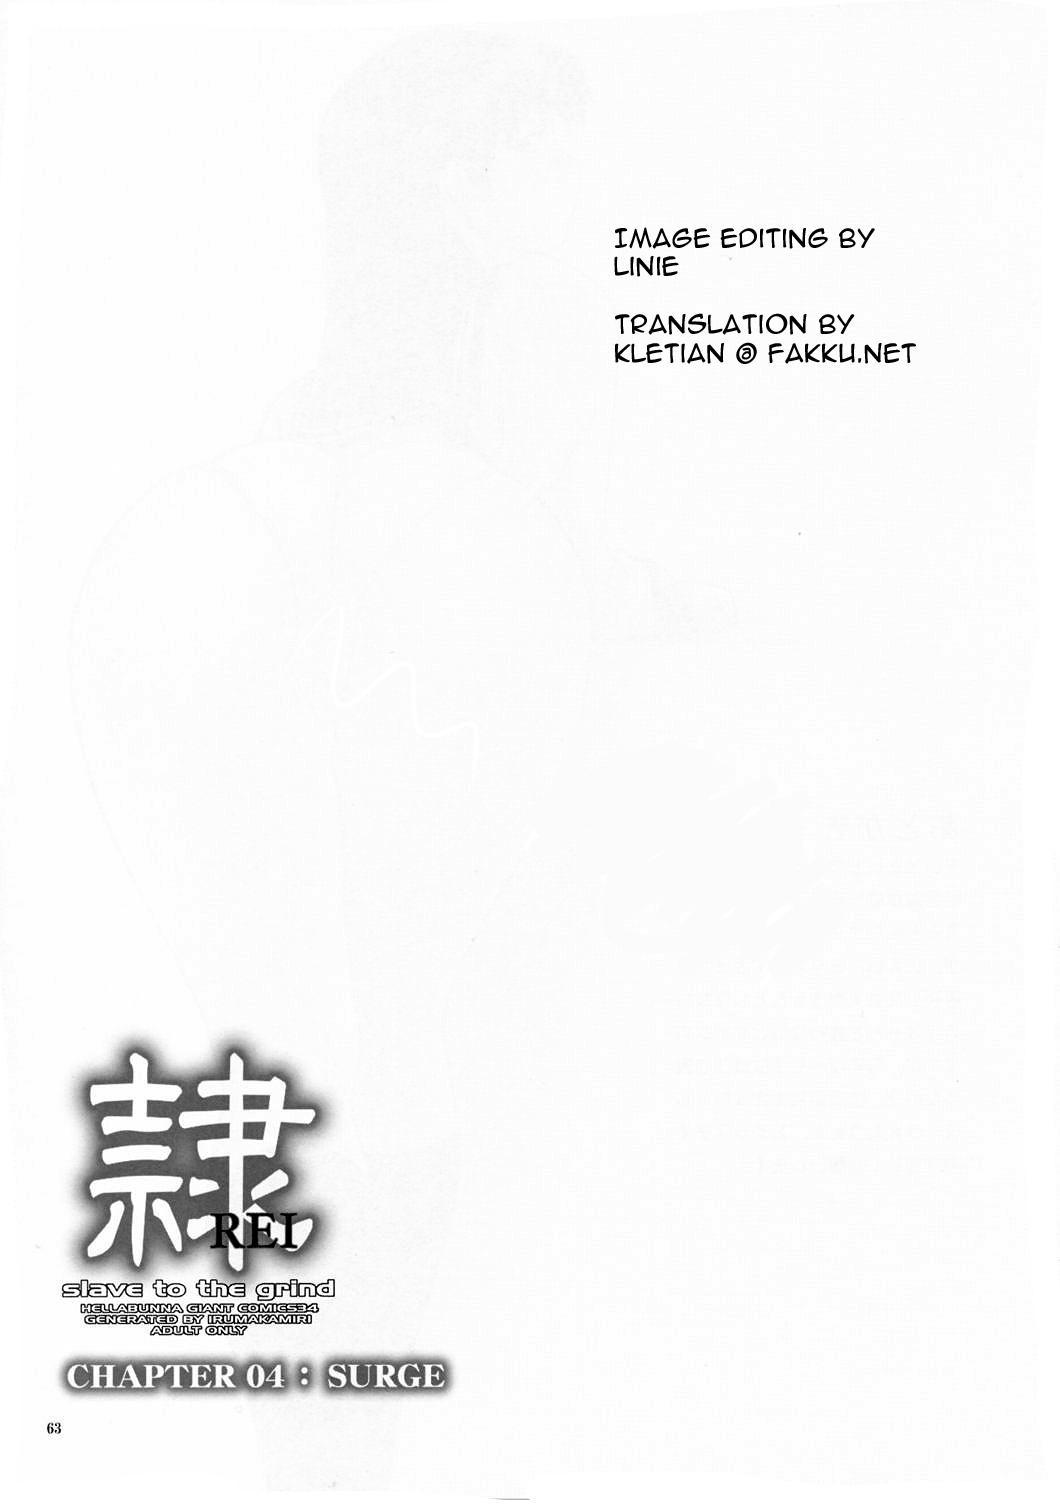 (C72) [Hellabunna (Iruma Kamiri)] REI - slave to the grind - CHAPTER 04: SURGE (Dead or Alive) [English] [Kletian] 61